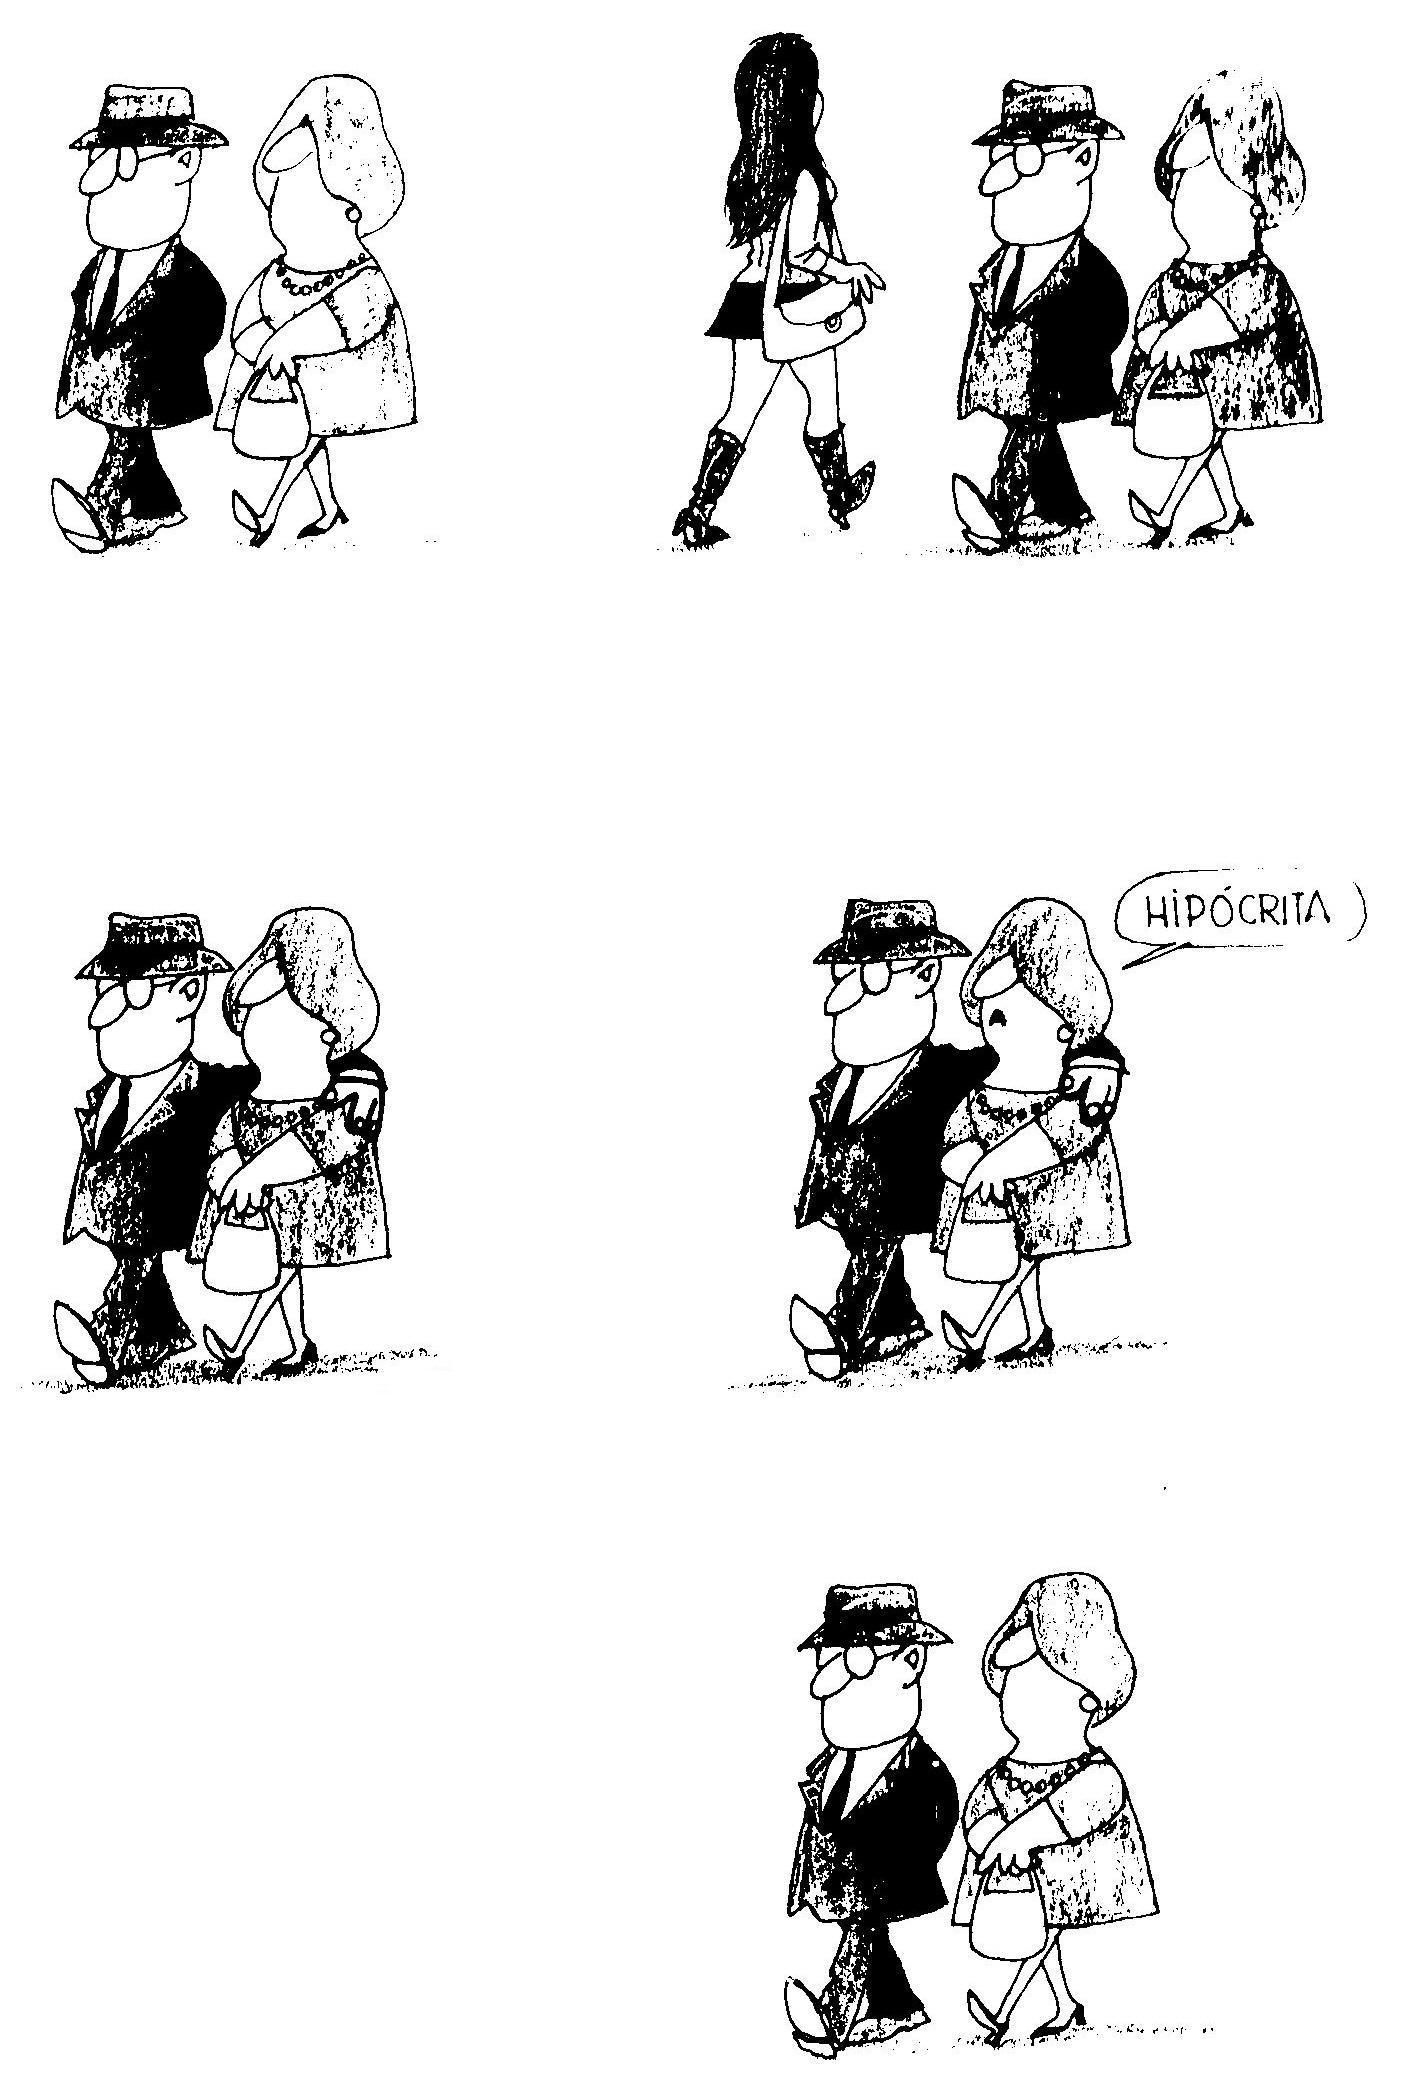 QuinoHipocritapng 14132089  humor  Pinterest  Mafalda